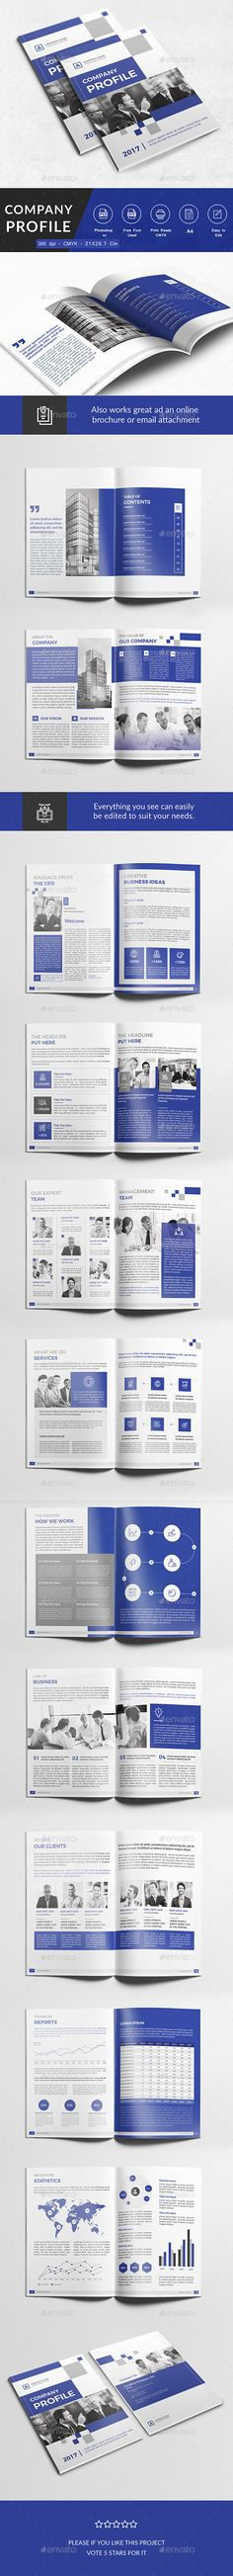 Company Profile Brochure Template InDesign INDD Download here - profile company template